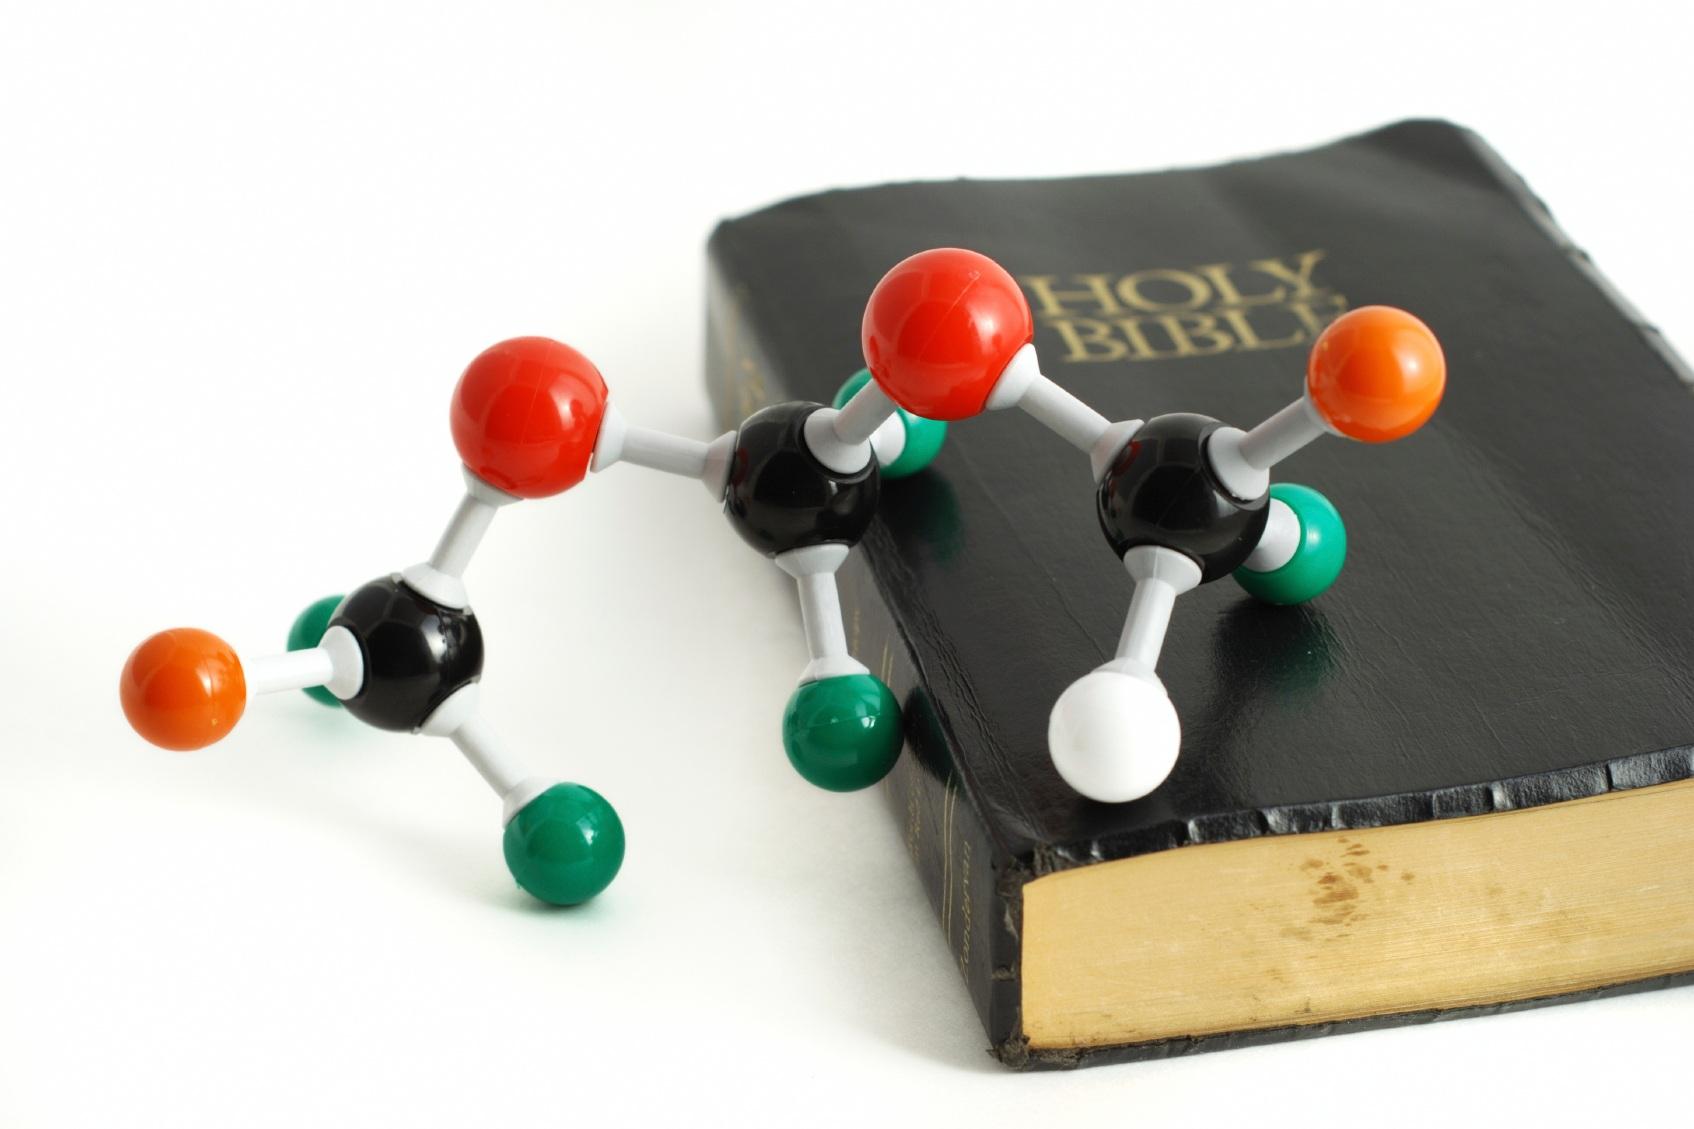 Christian Scholar's Forum - [2006 - 2008, The University of Texas at Austin]